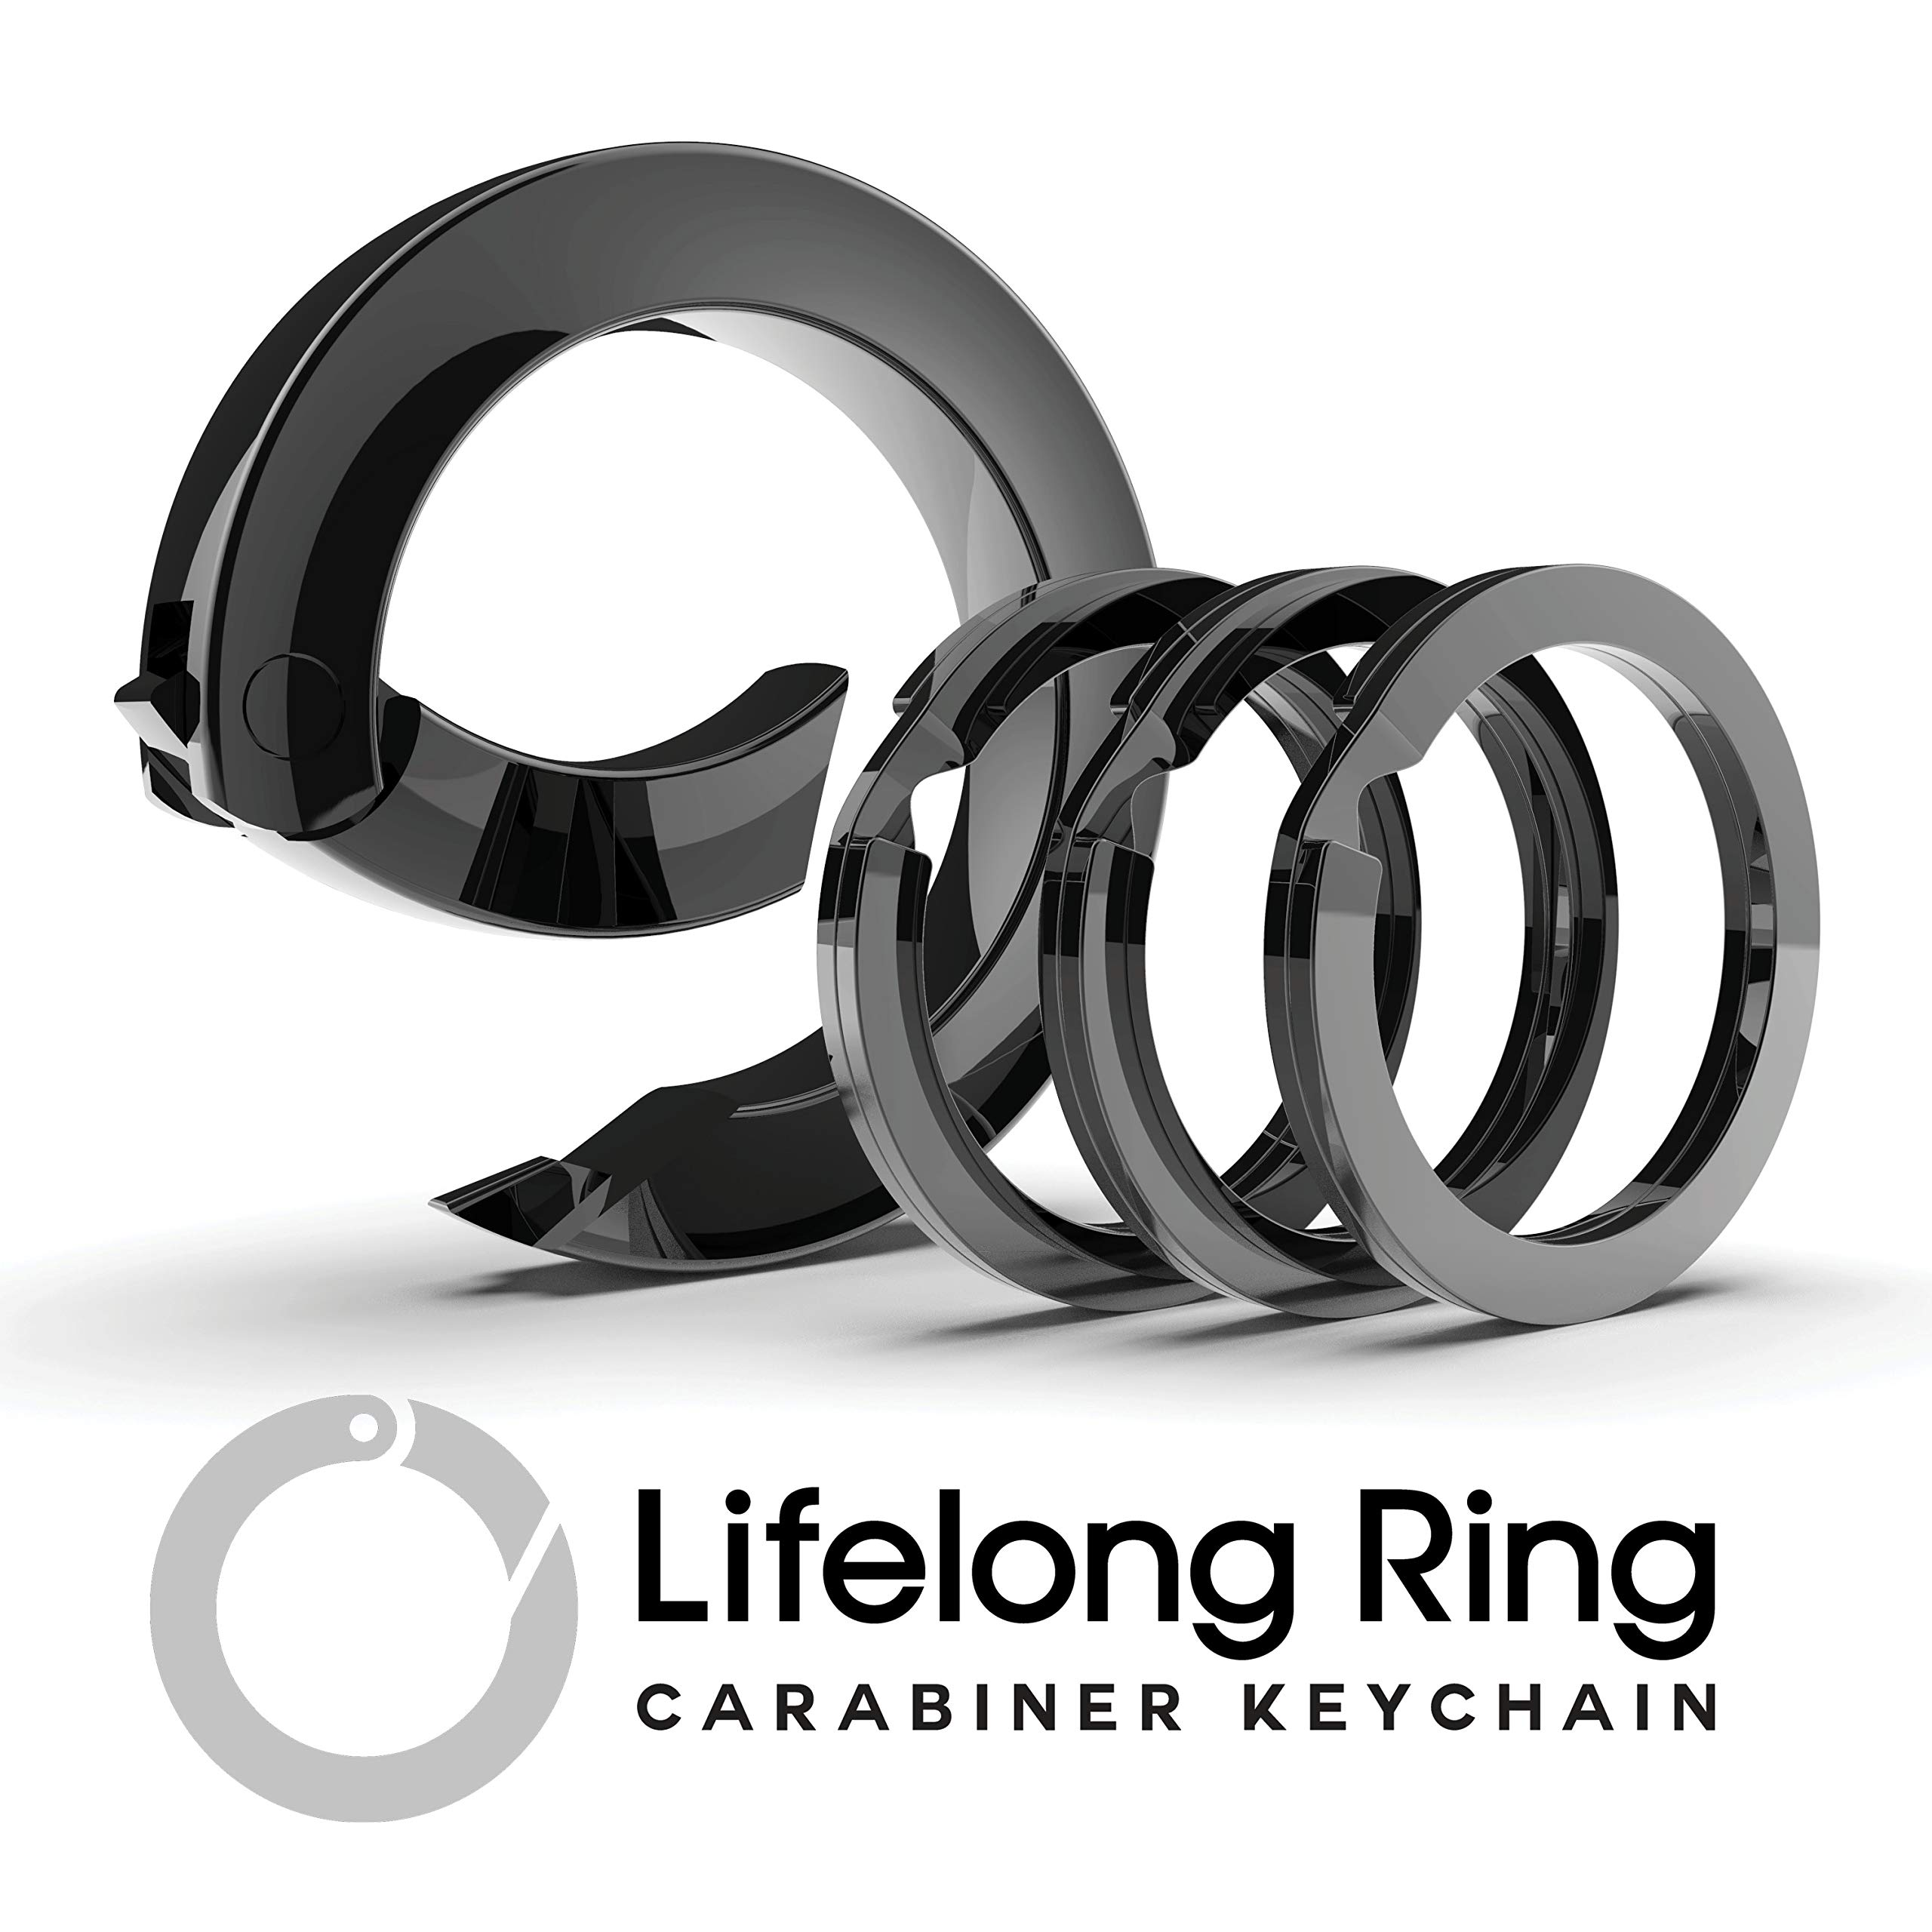 Lifelong Ring Carabiner Keychain Graphite